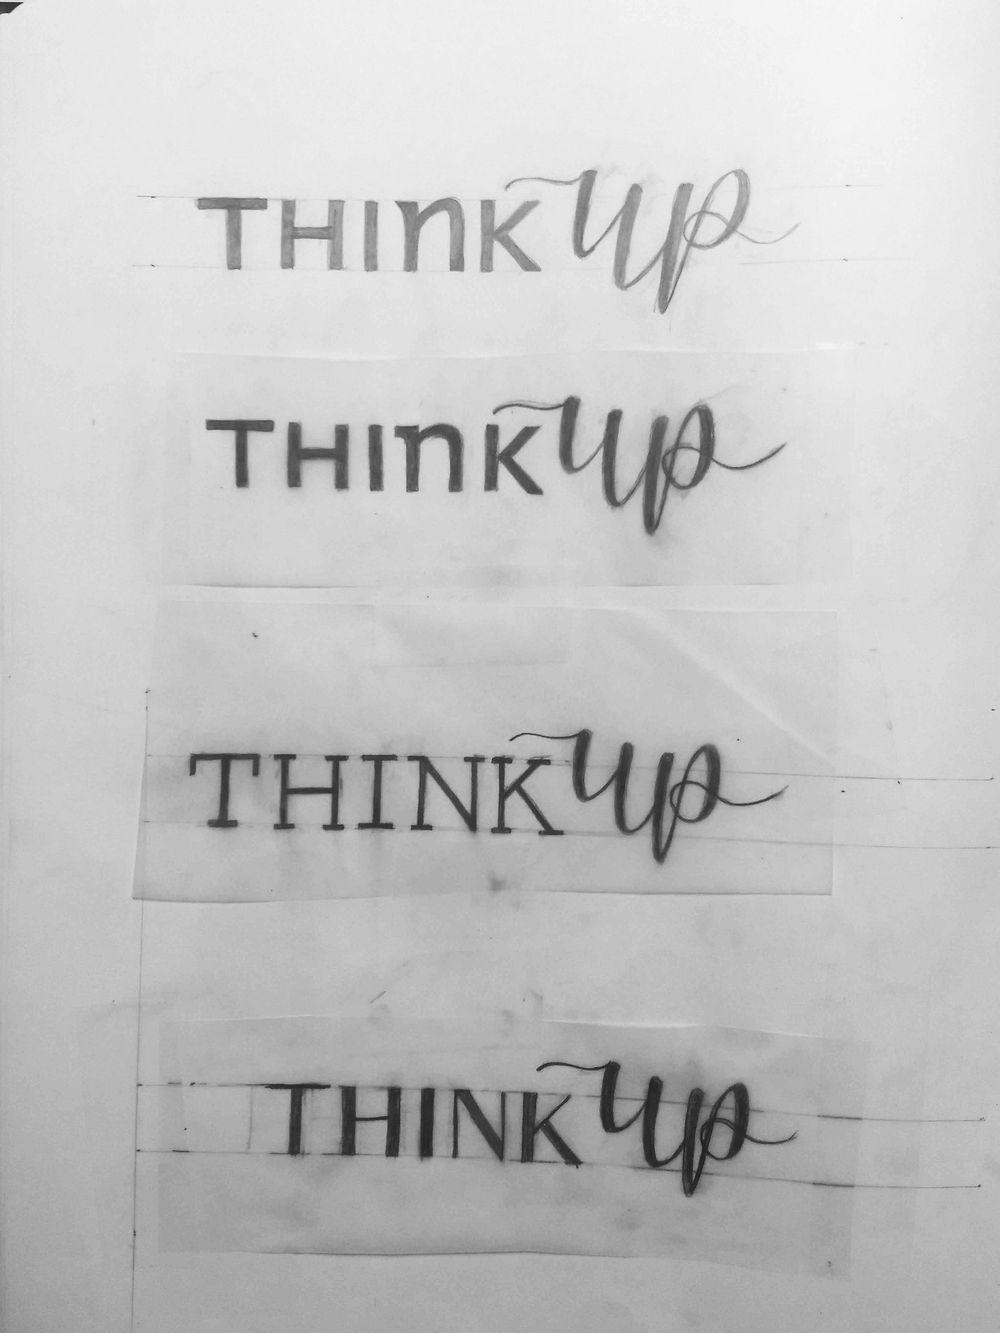 ThinkUp - image 8 - student project